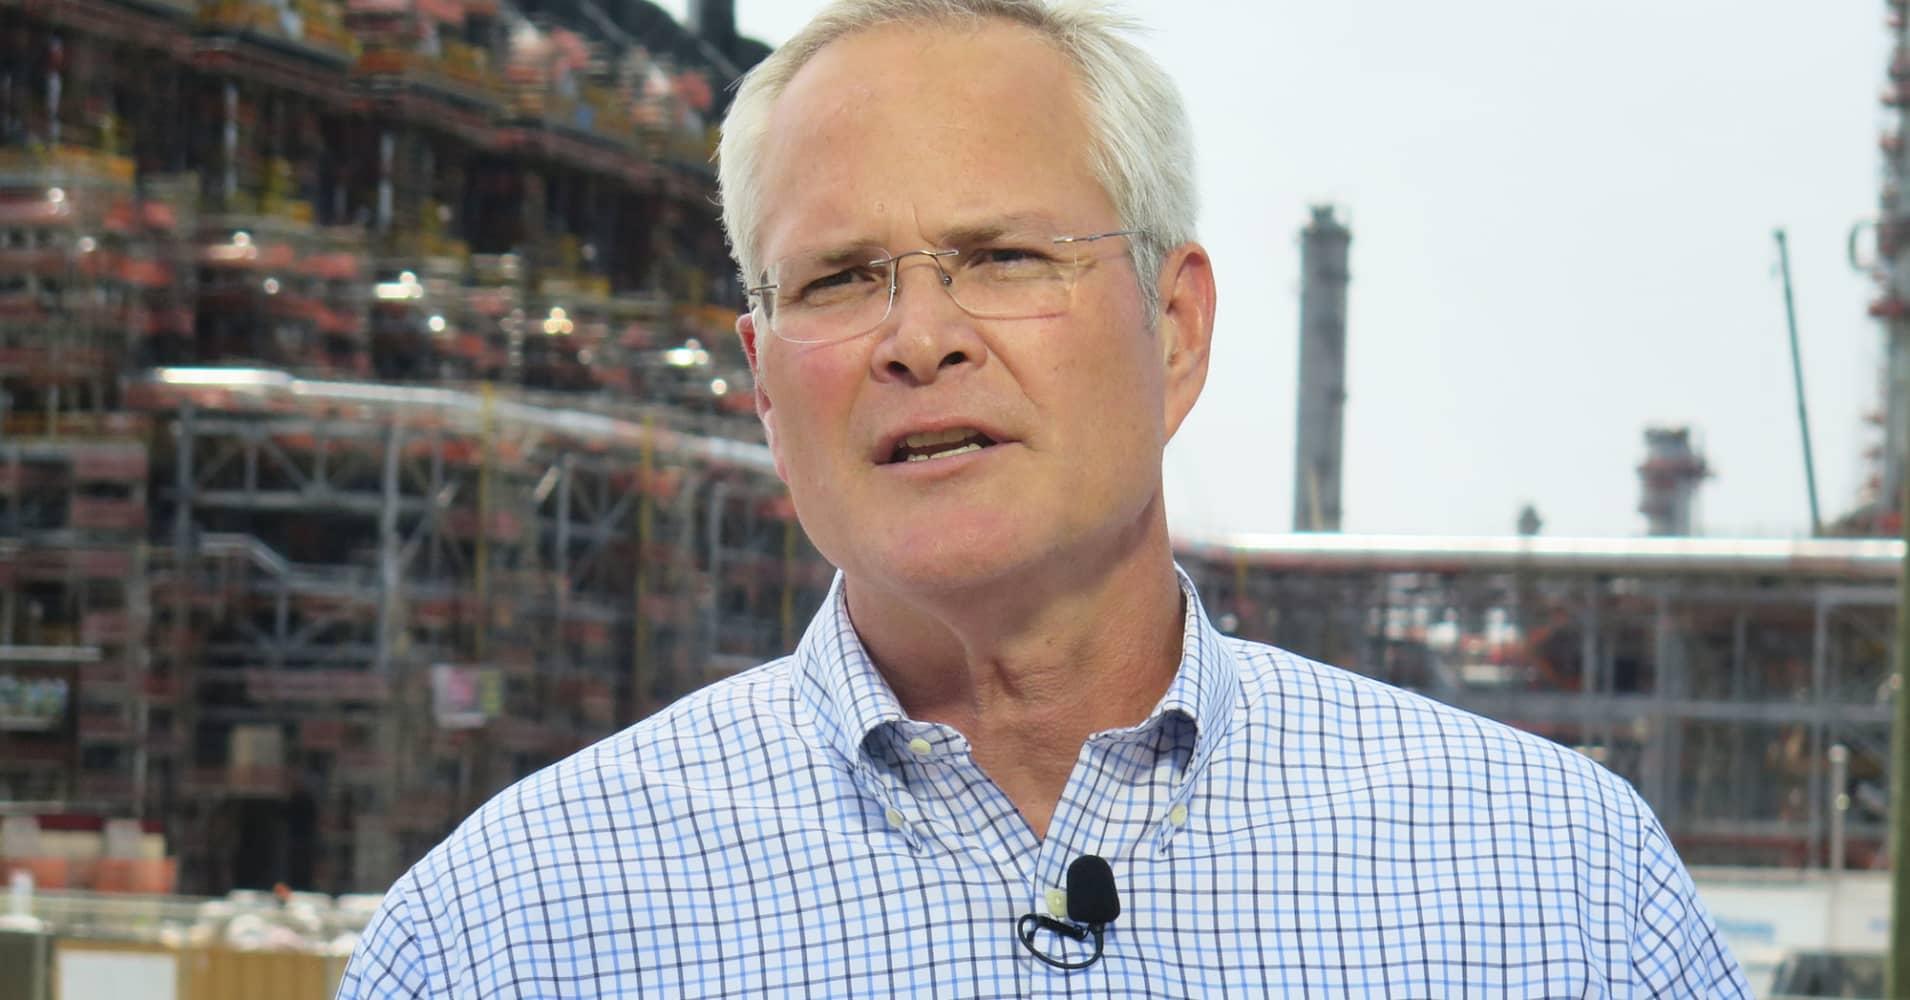 Exxon Mobil posts big quarterly profit beat as oil major hikes production